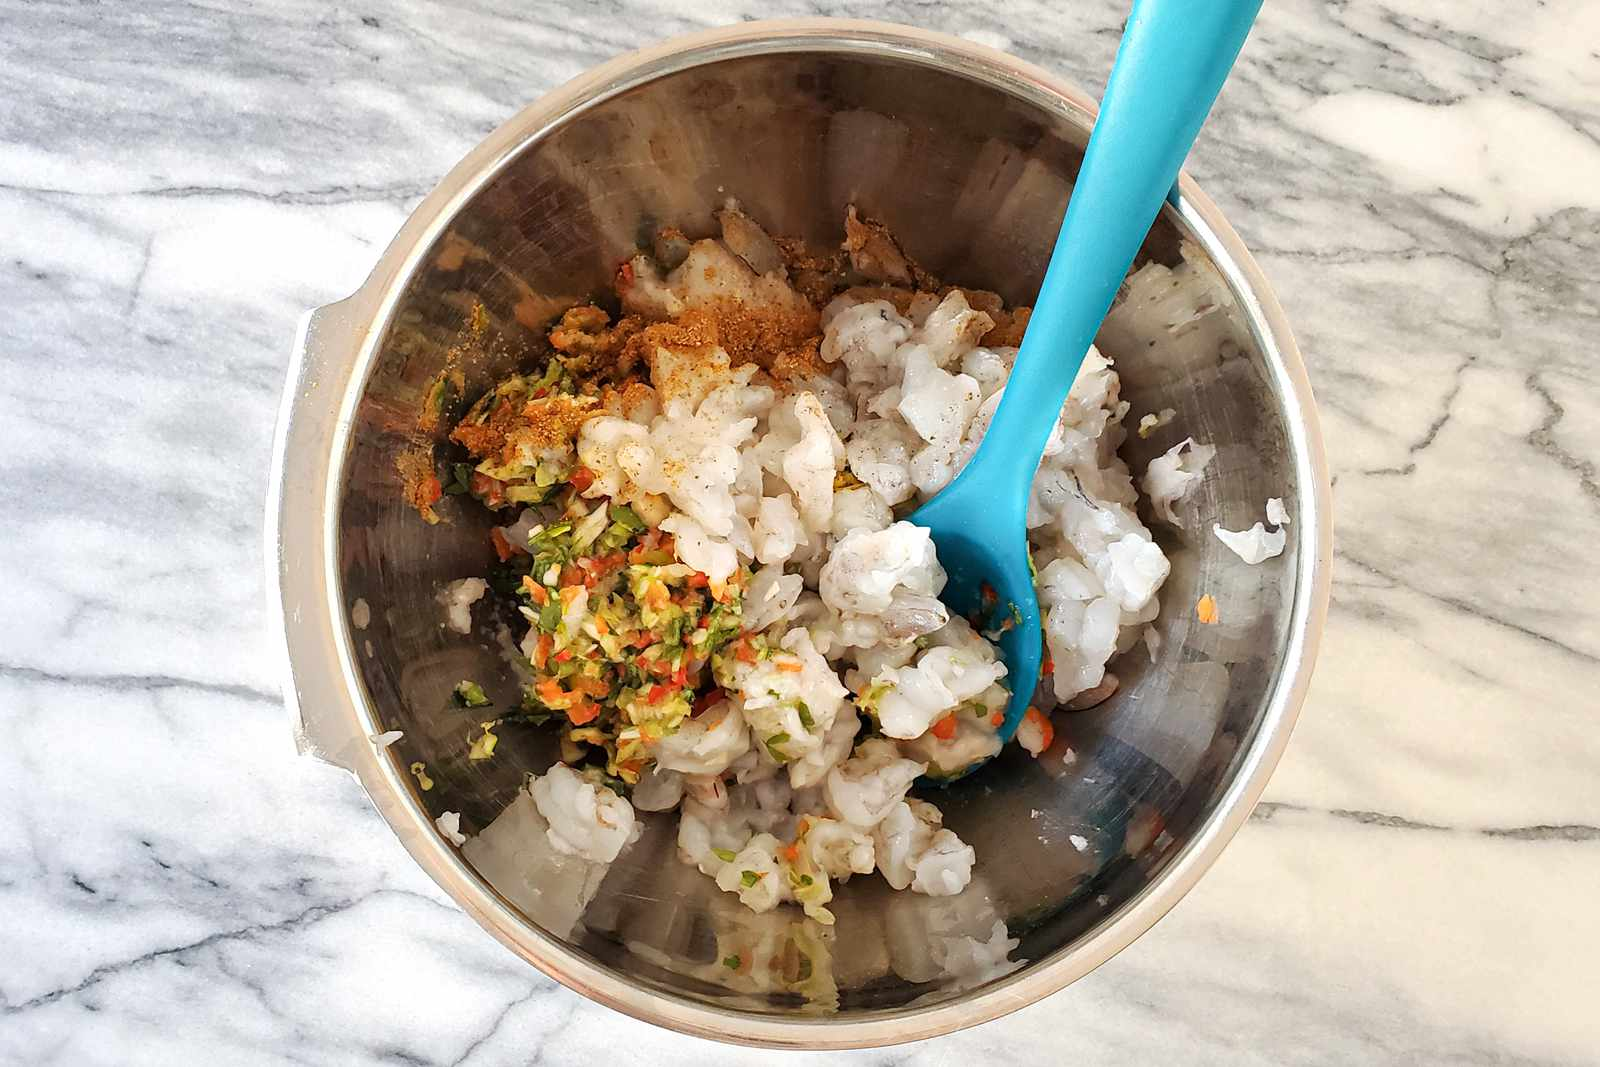 Mixture for shrimp burgers.